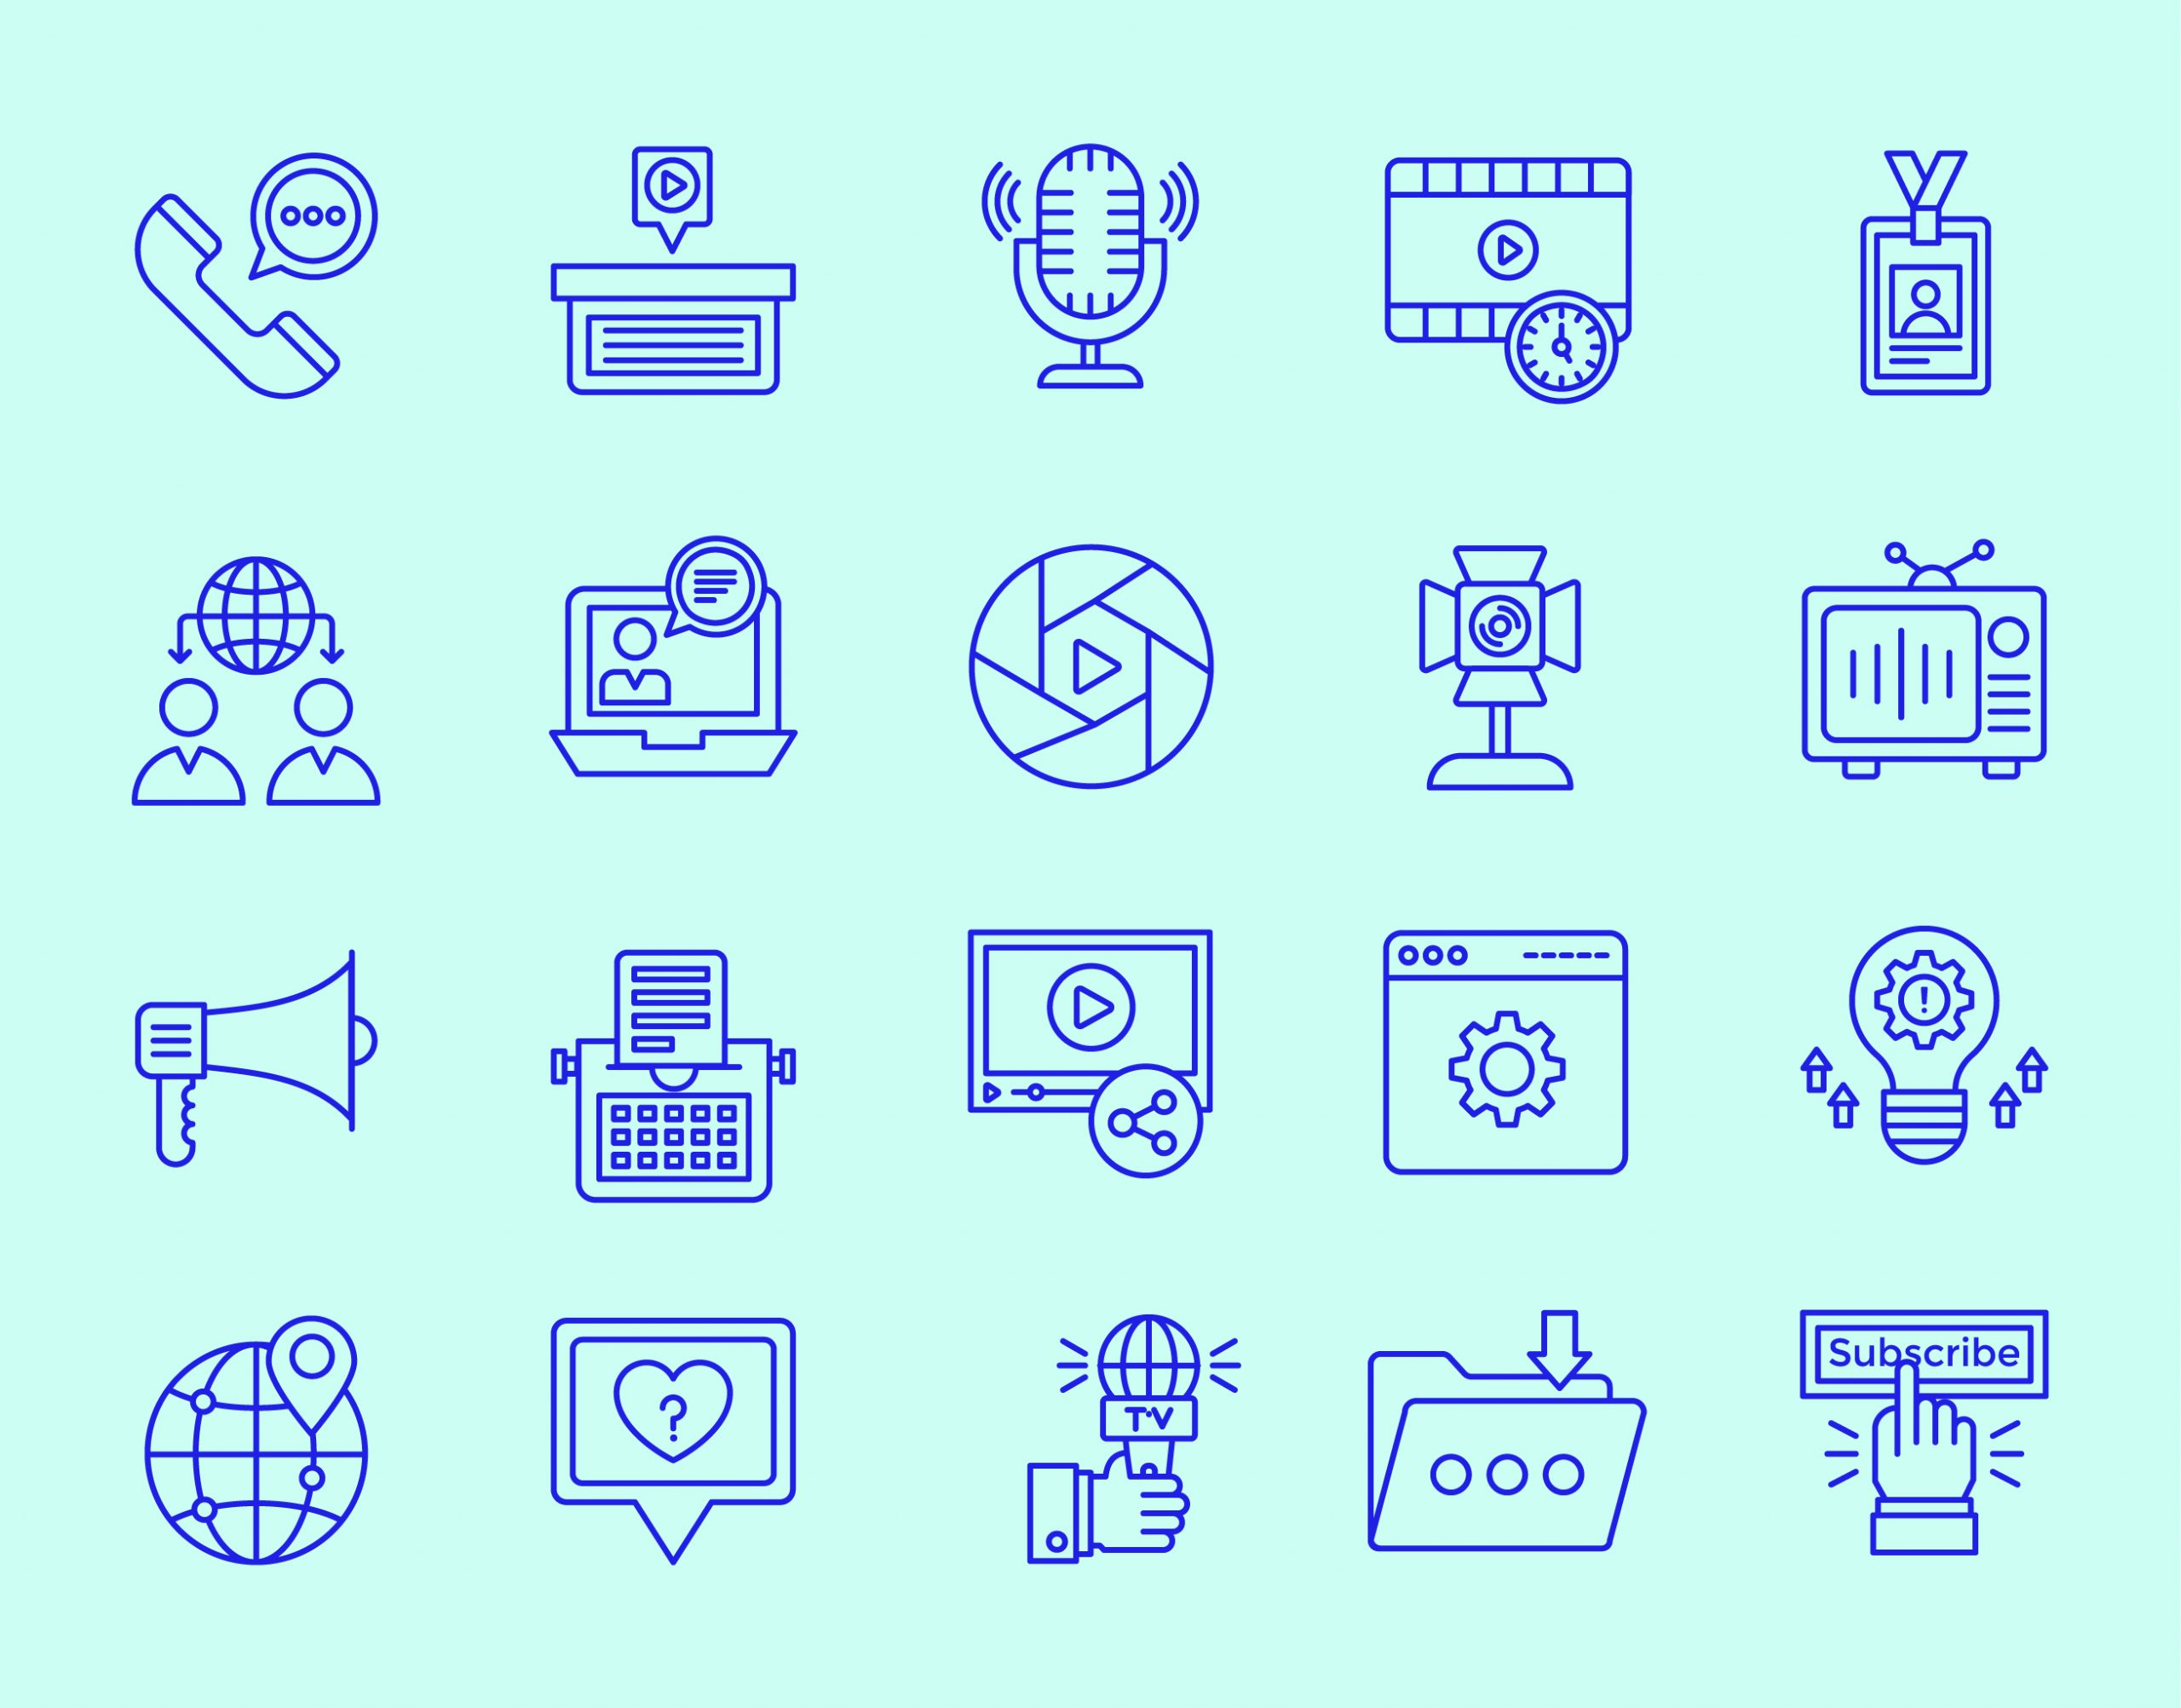 Media and Marketing Icons